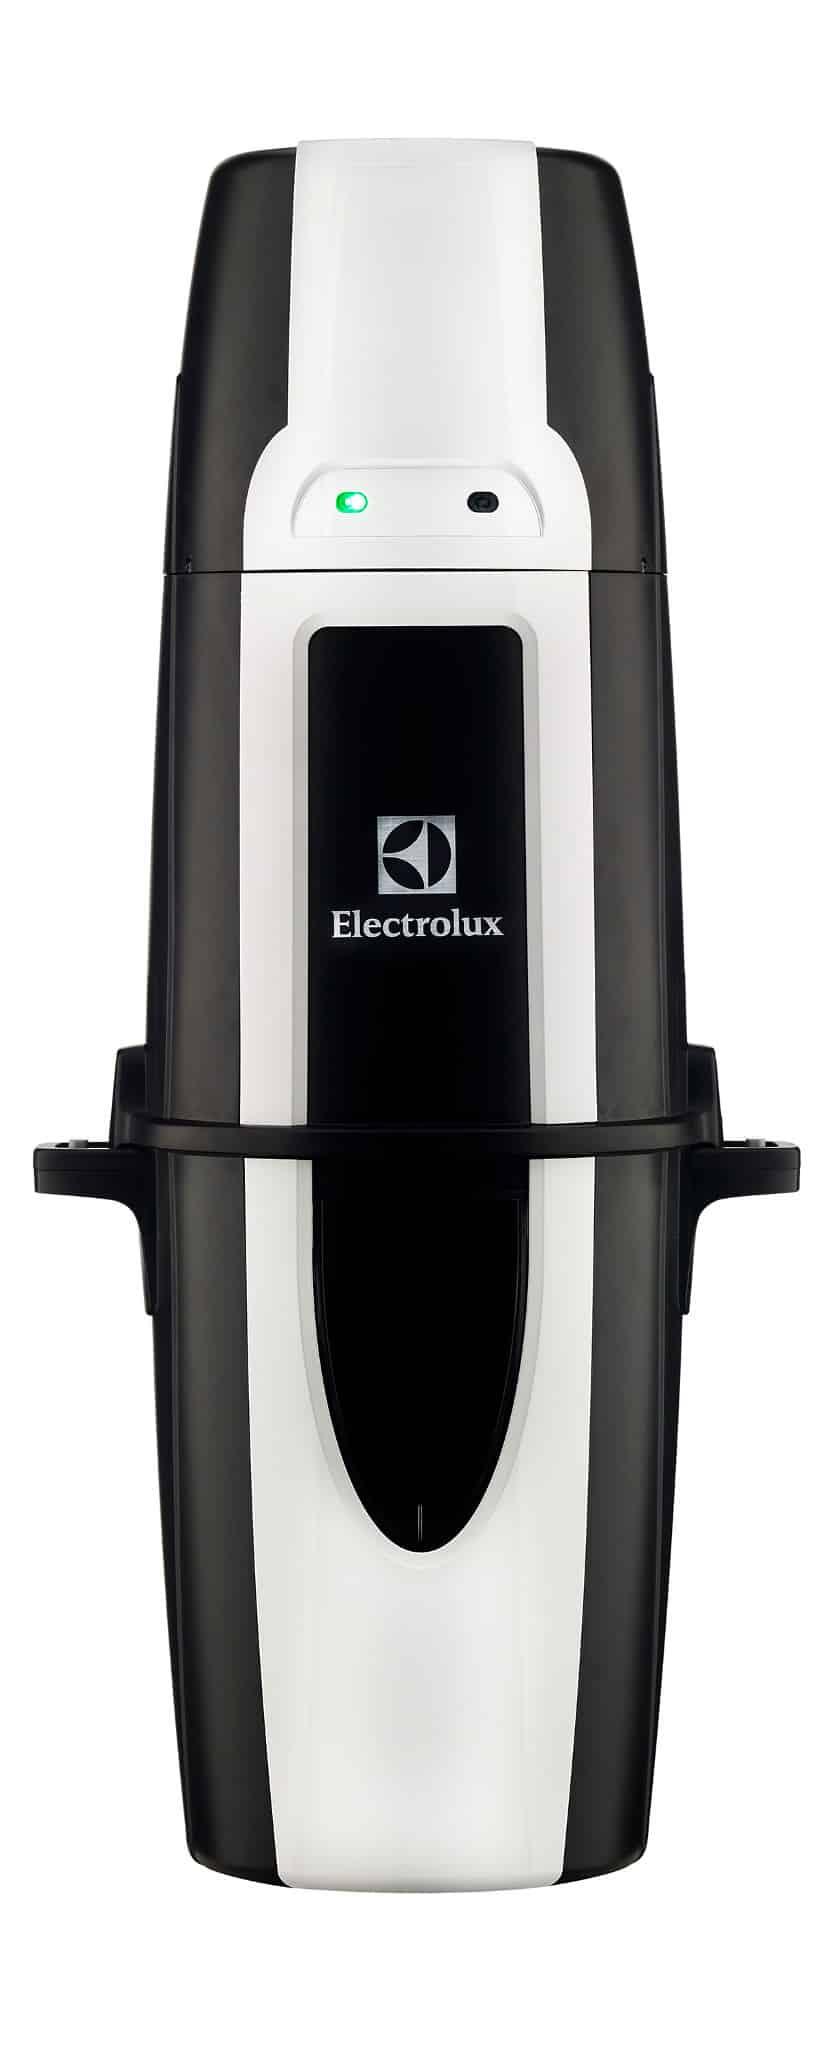 Electrolux Elx650 The Vacuum District